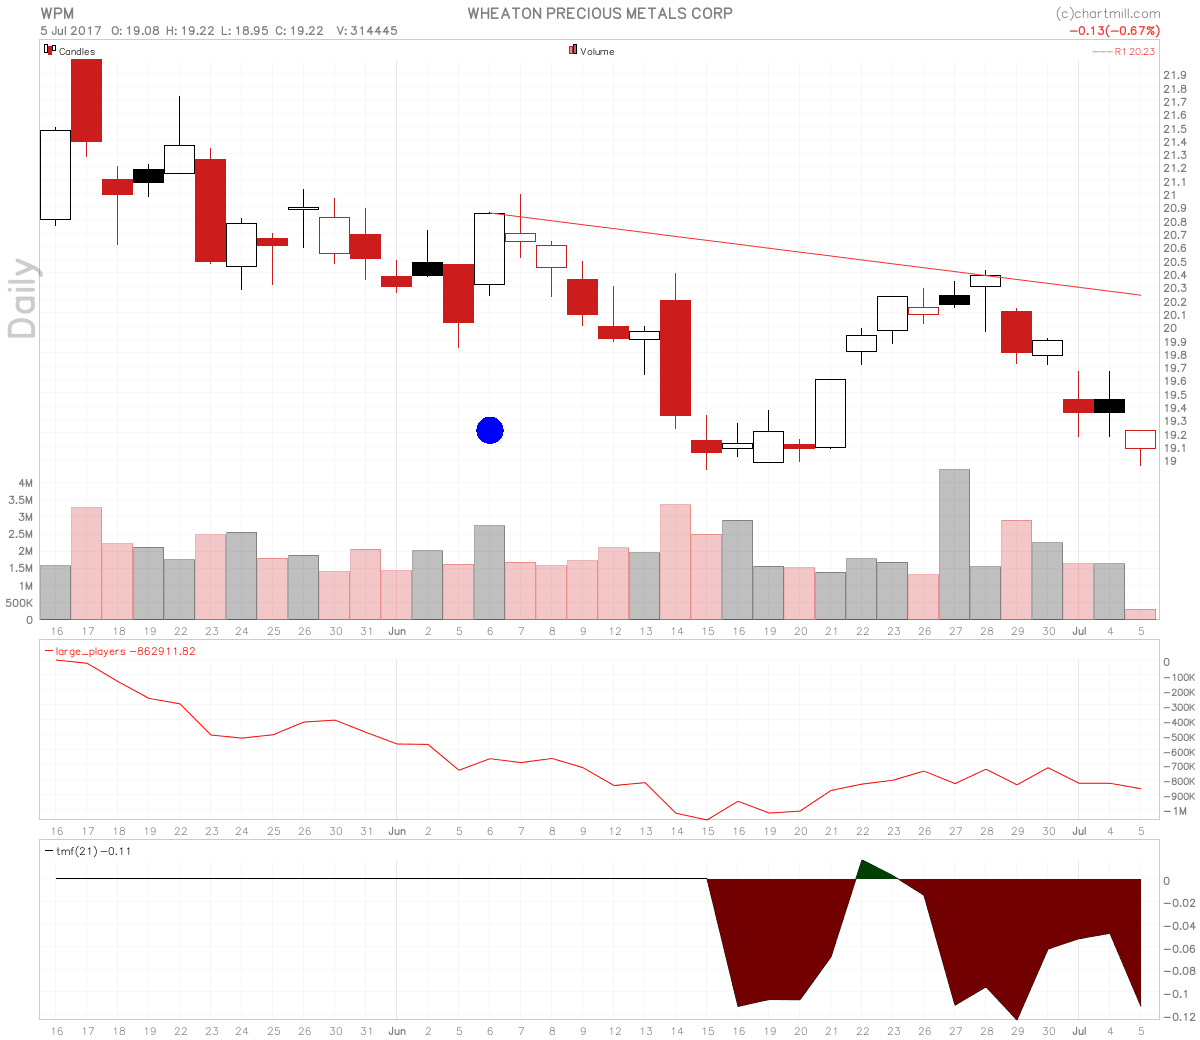 stocks-to-watch wpm chart - Wheaton Precious Metals and AG a Swing Long Setup